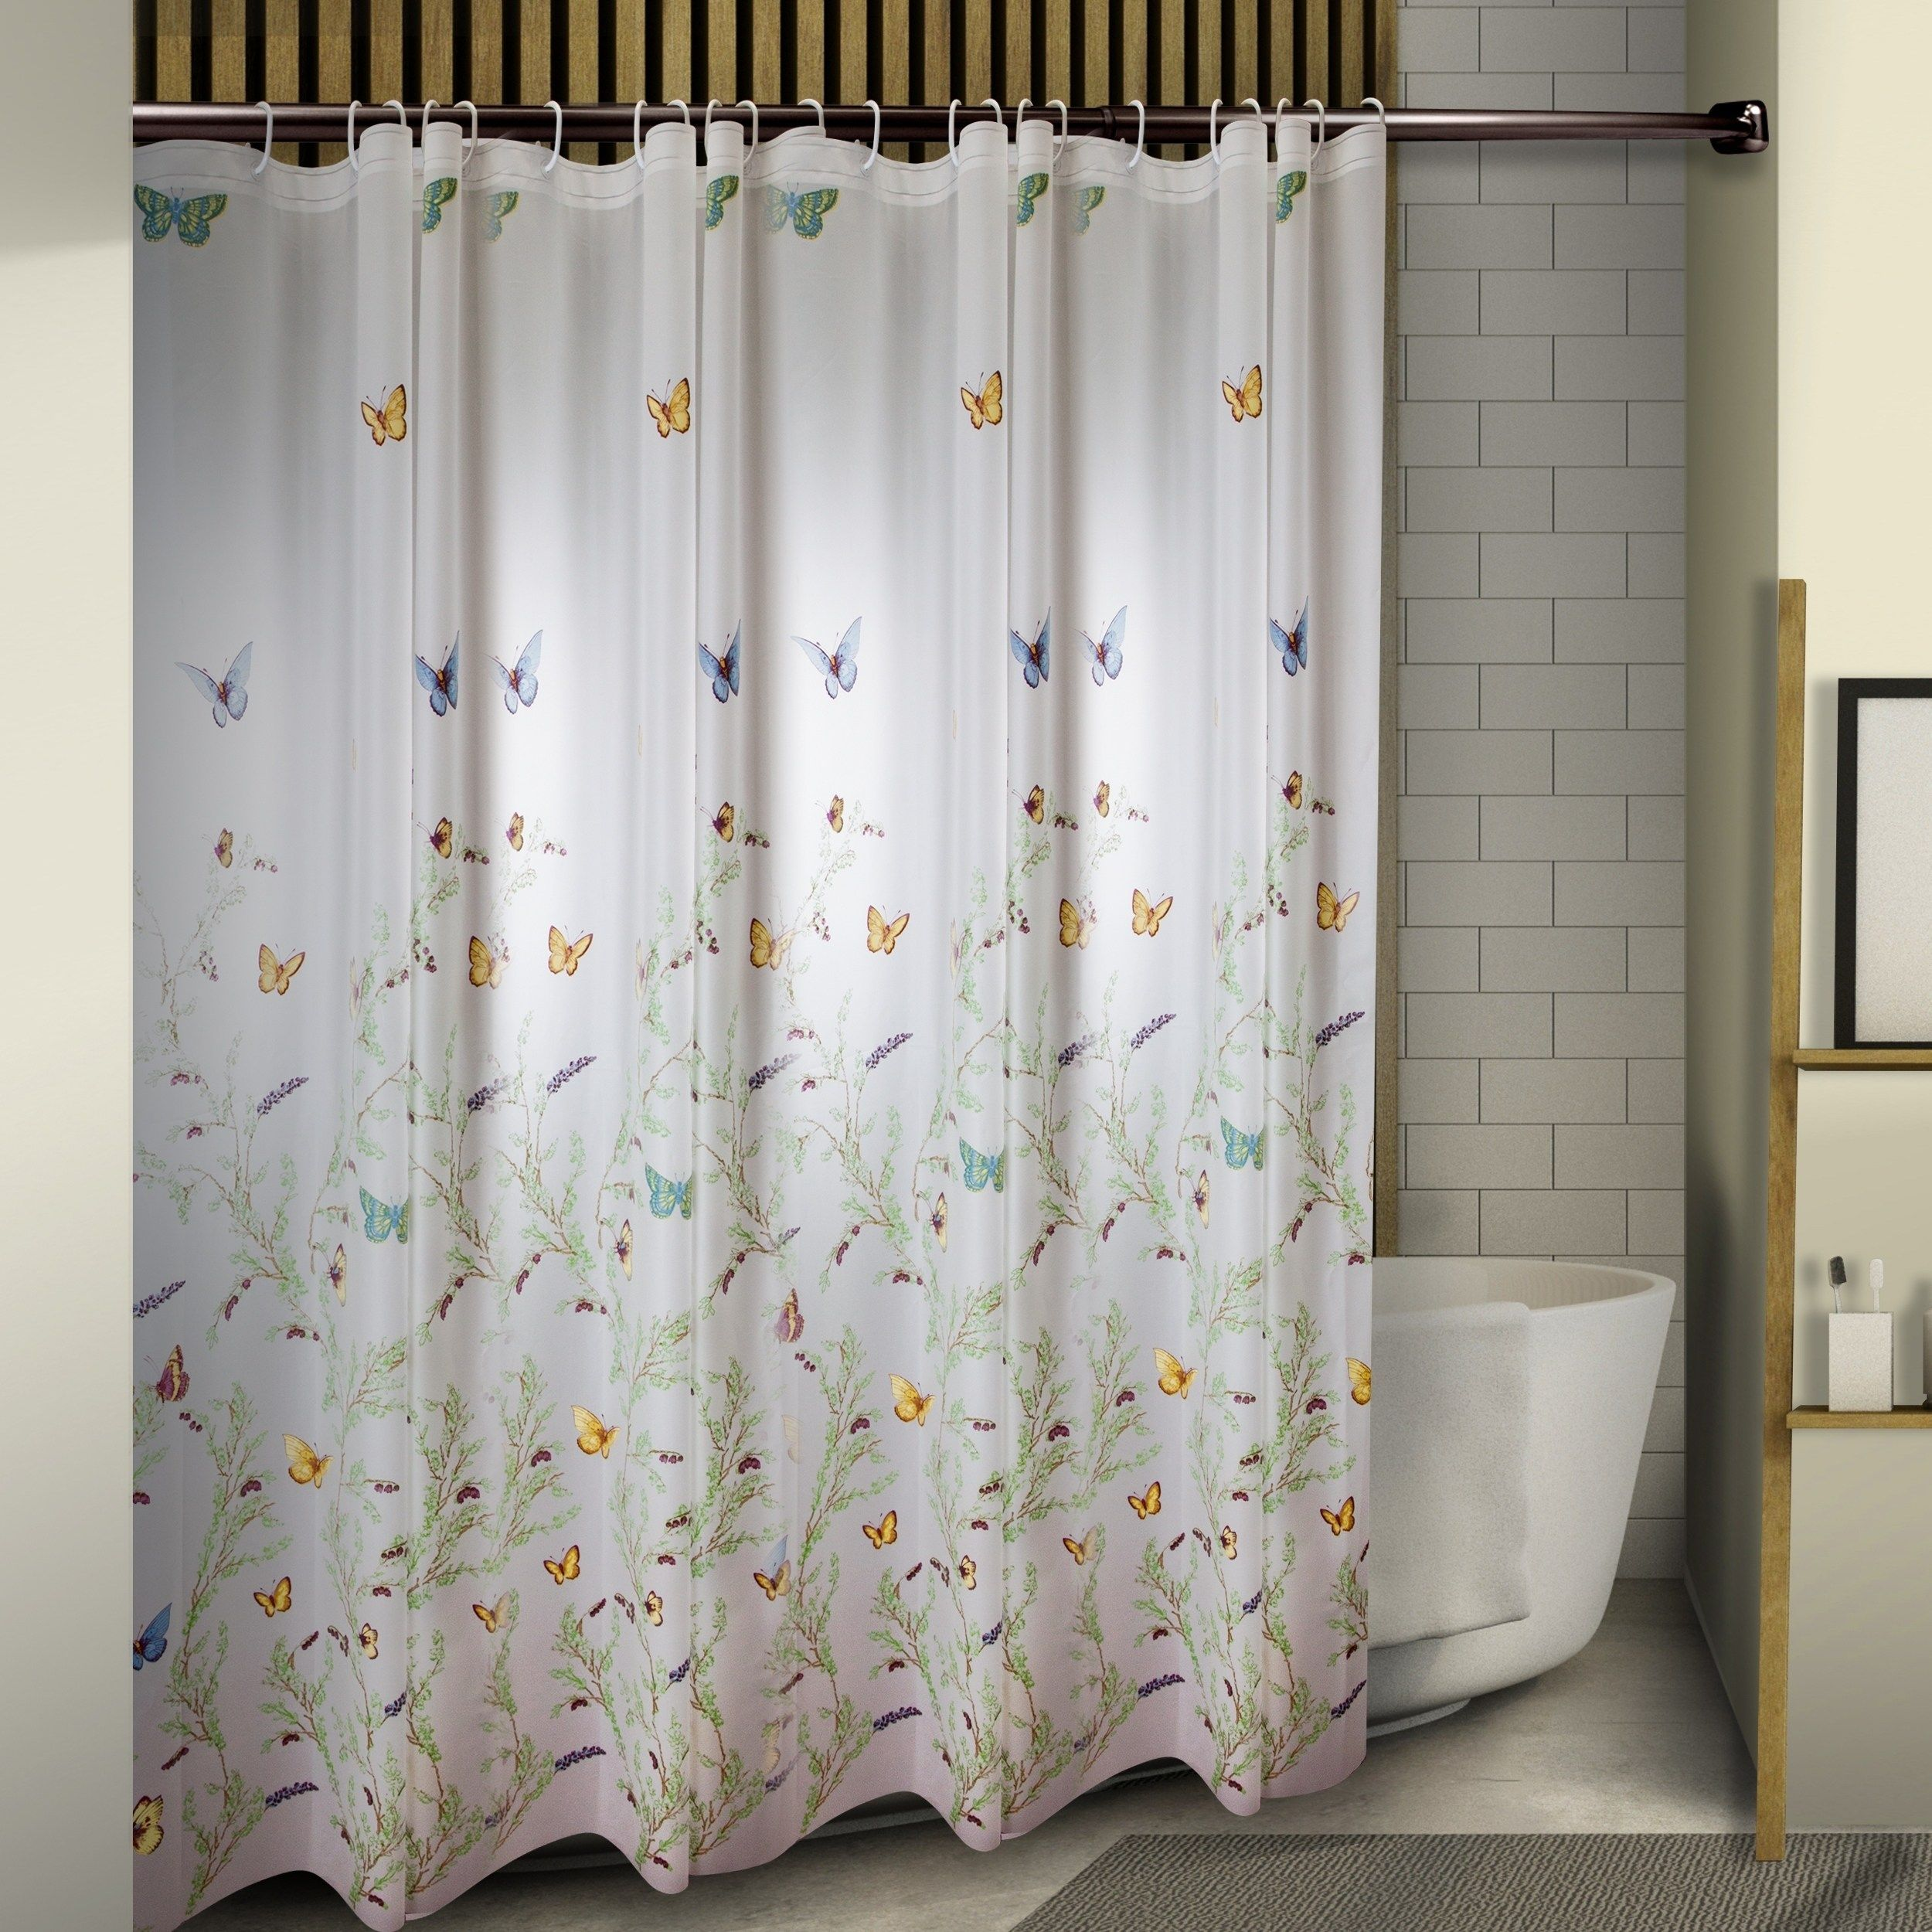 Instyledesign Butterflies Shower Curtain 71 X 71 Multi